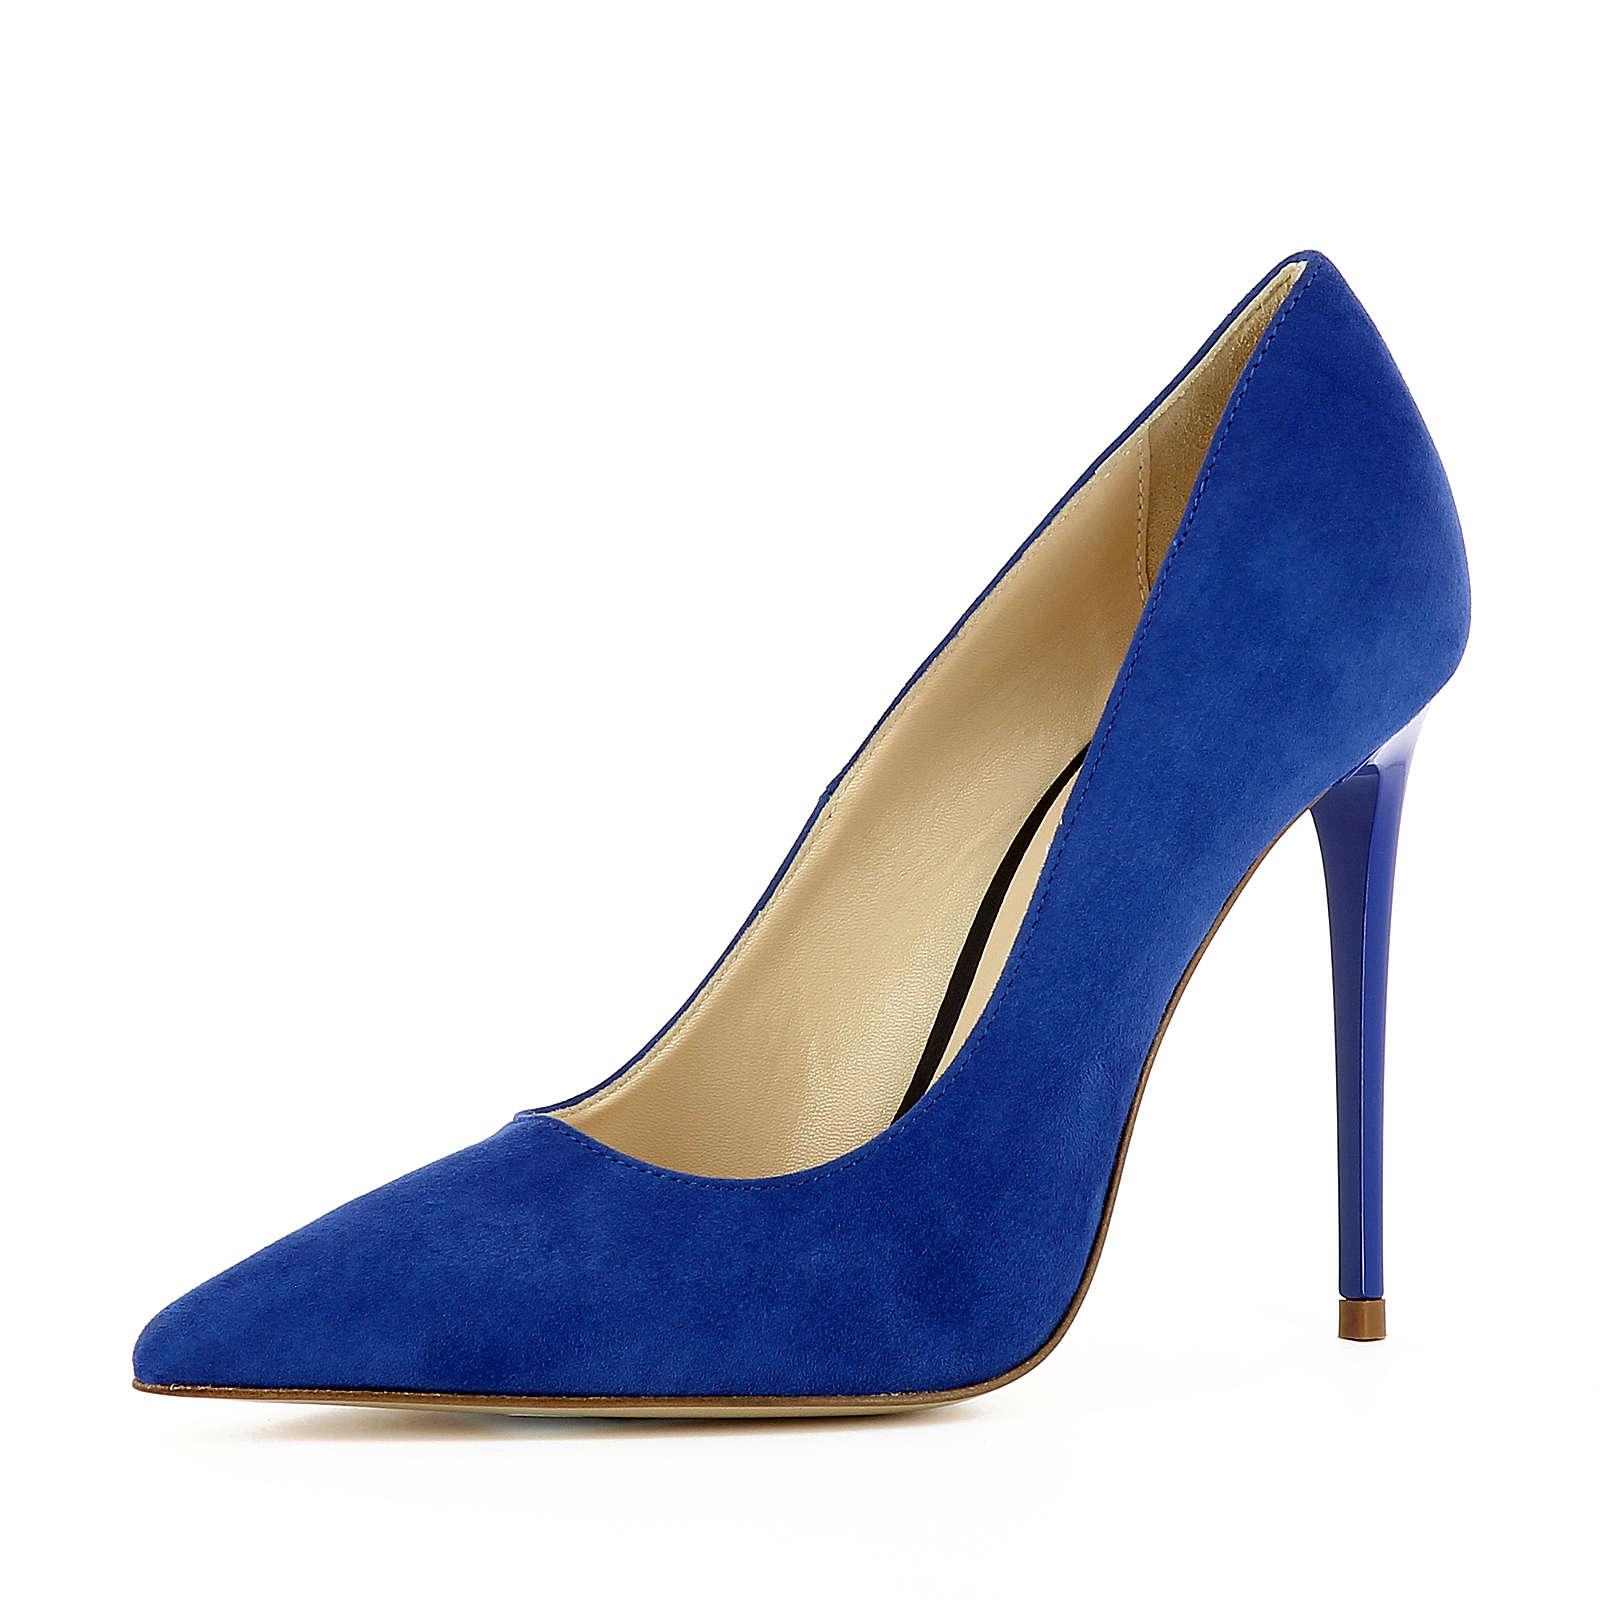 Evita Shoes Klassische Pumps DESIDERIA indigo Damen Gr. 35